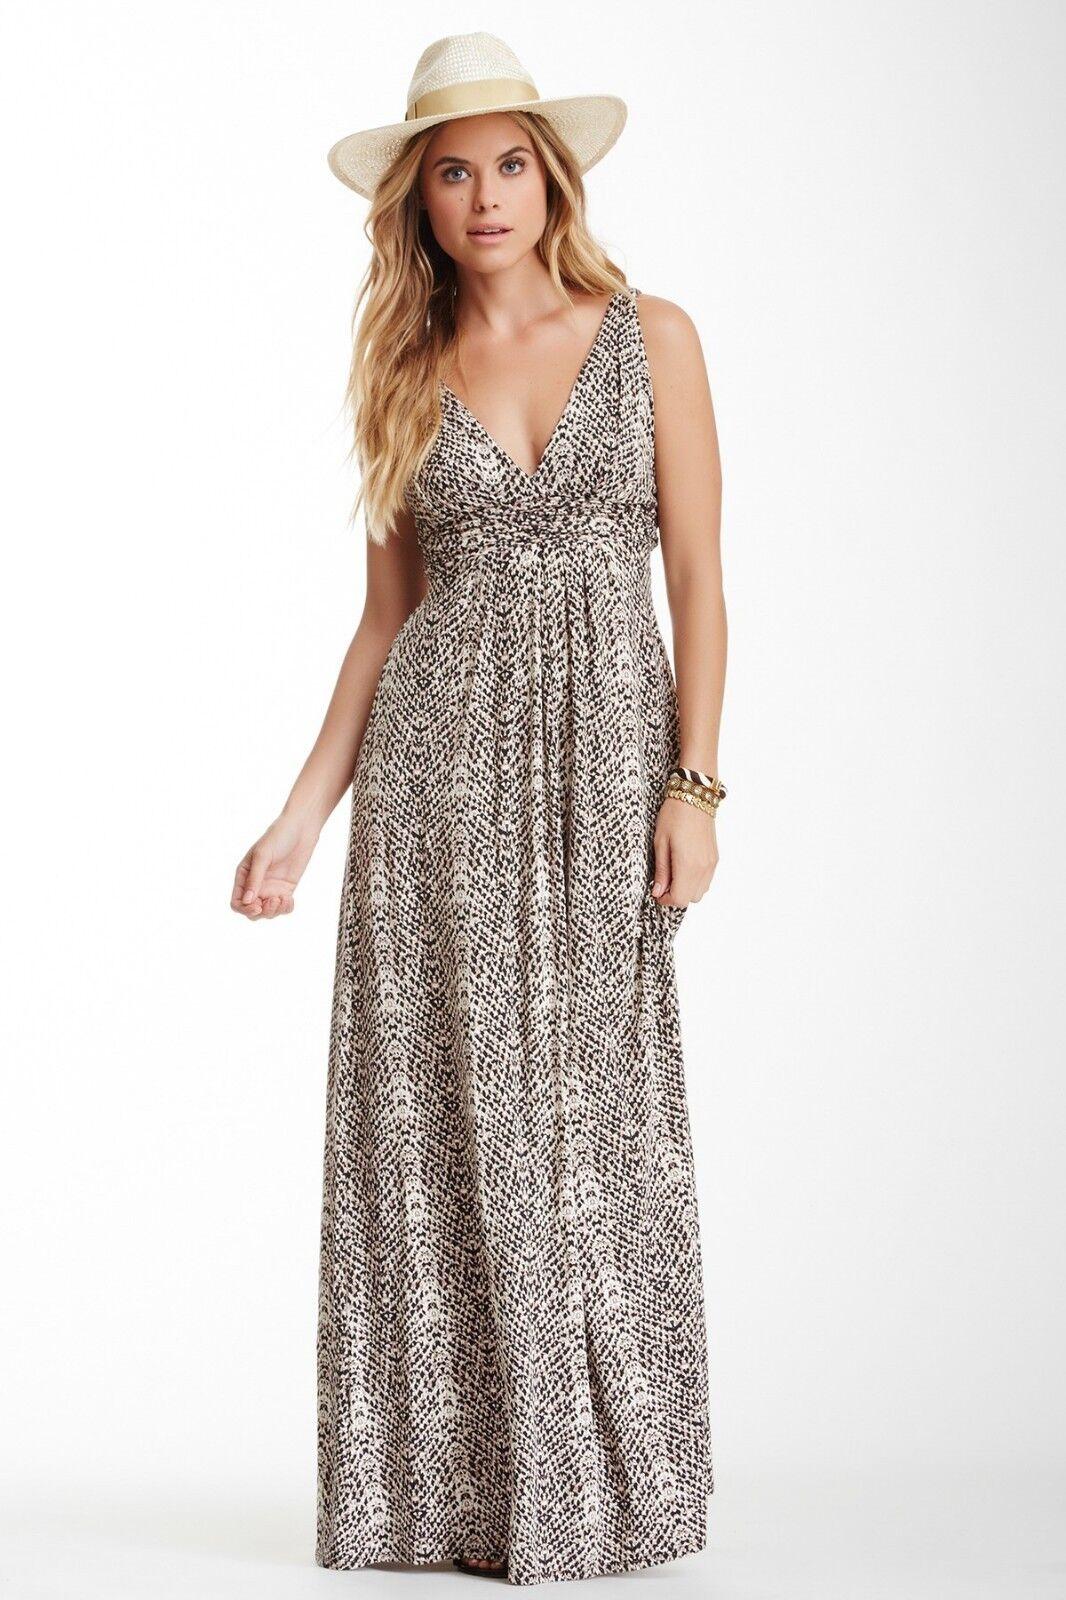 TART Collections 'Adrianna' Neutral Snake Print Maxi Dress - Sz M NWT